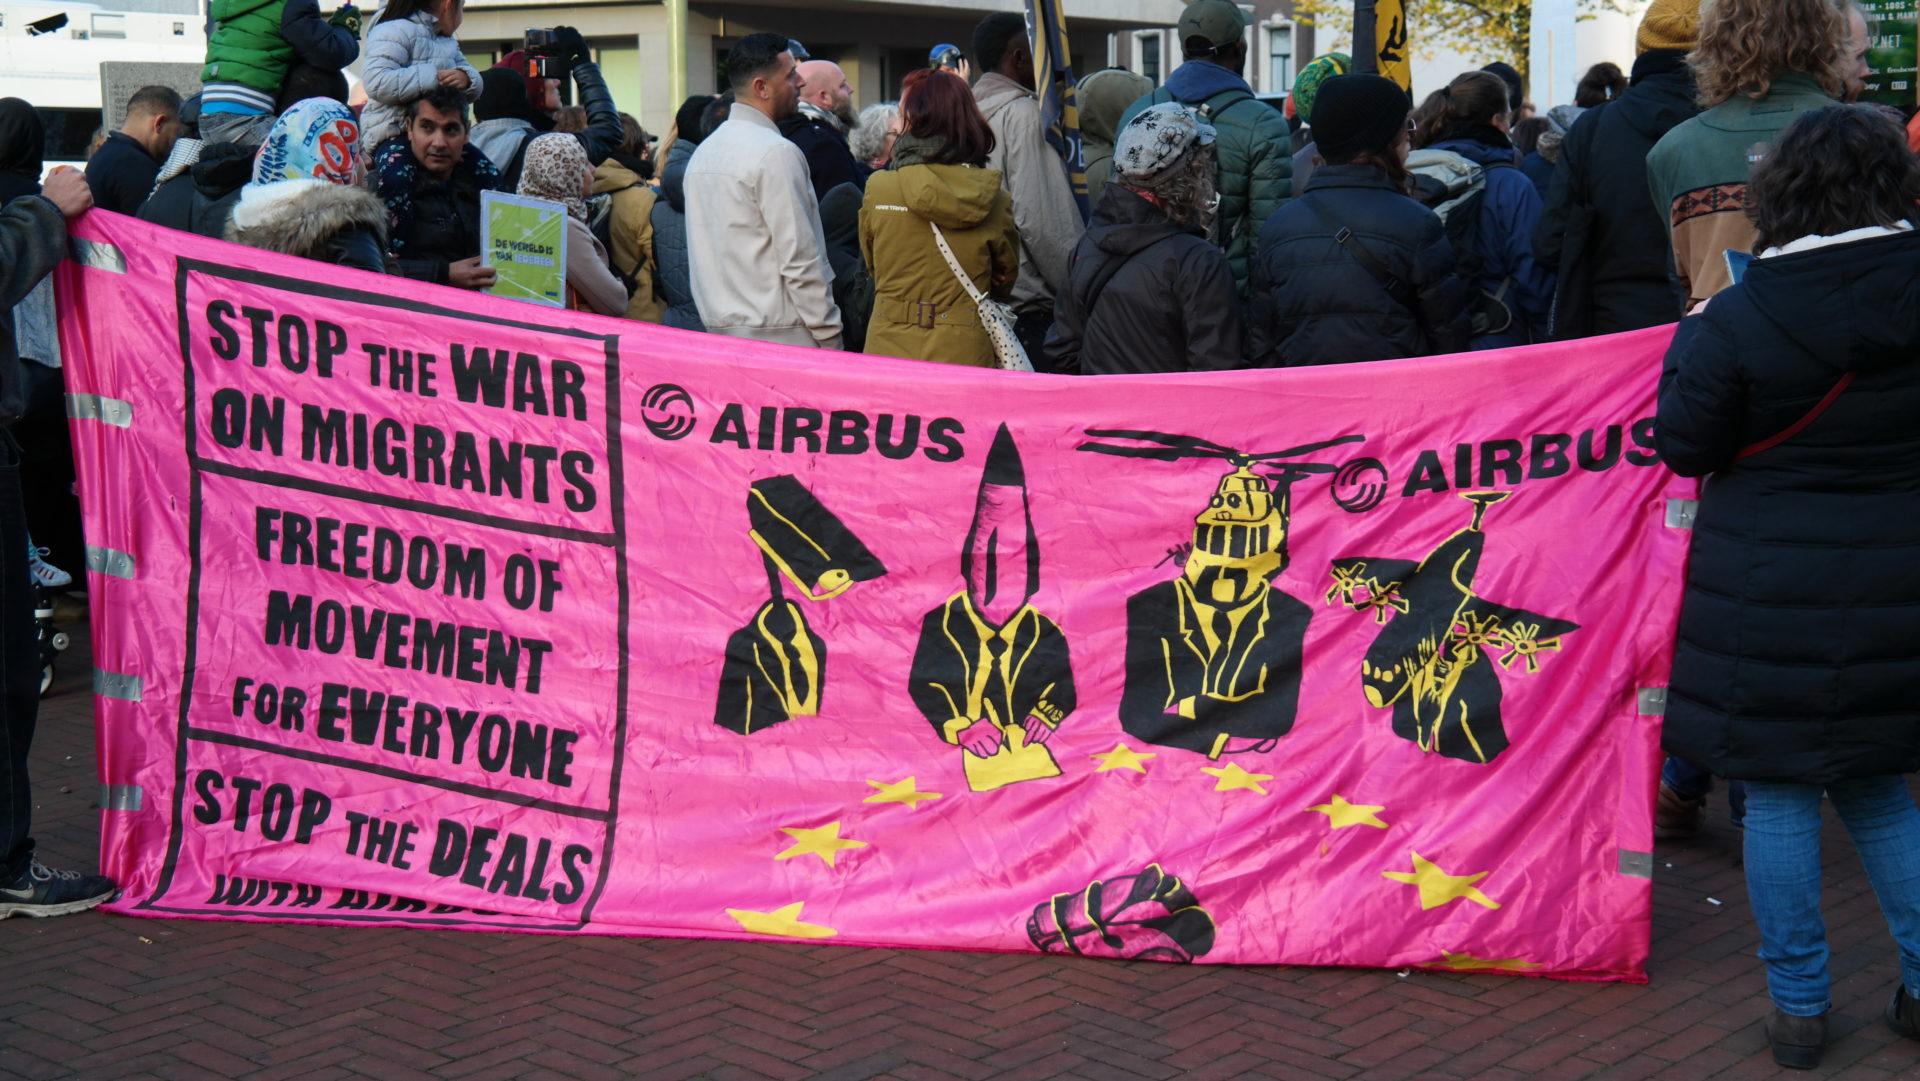 Airbus-propagandist Hannah de Vries